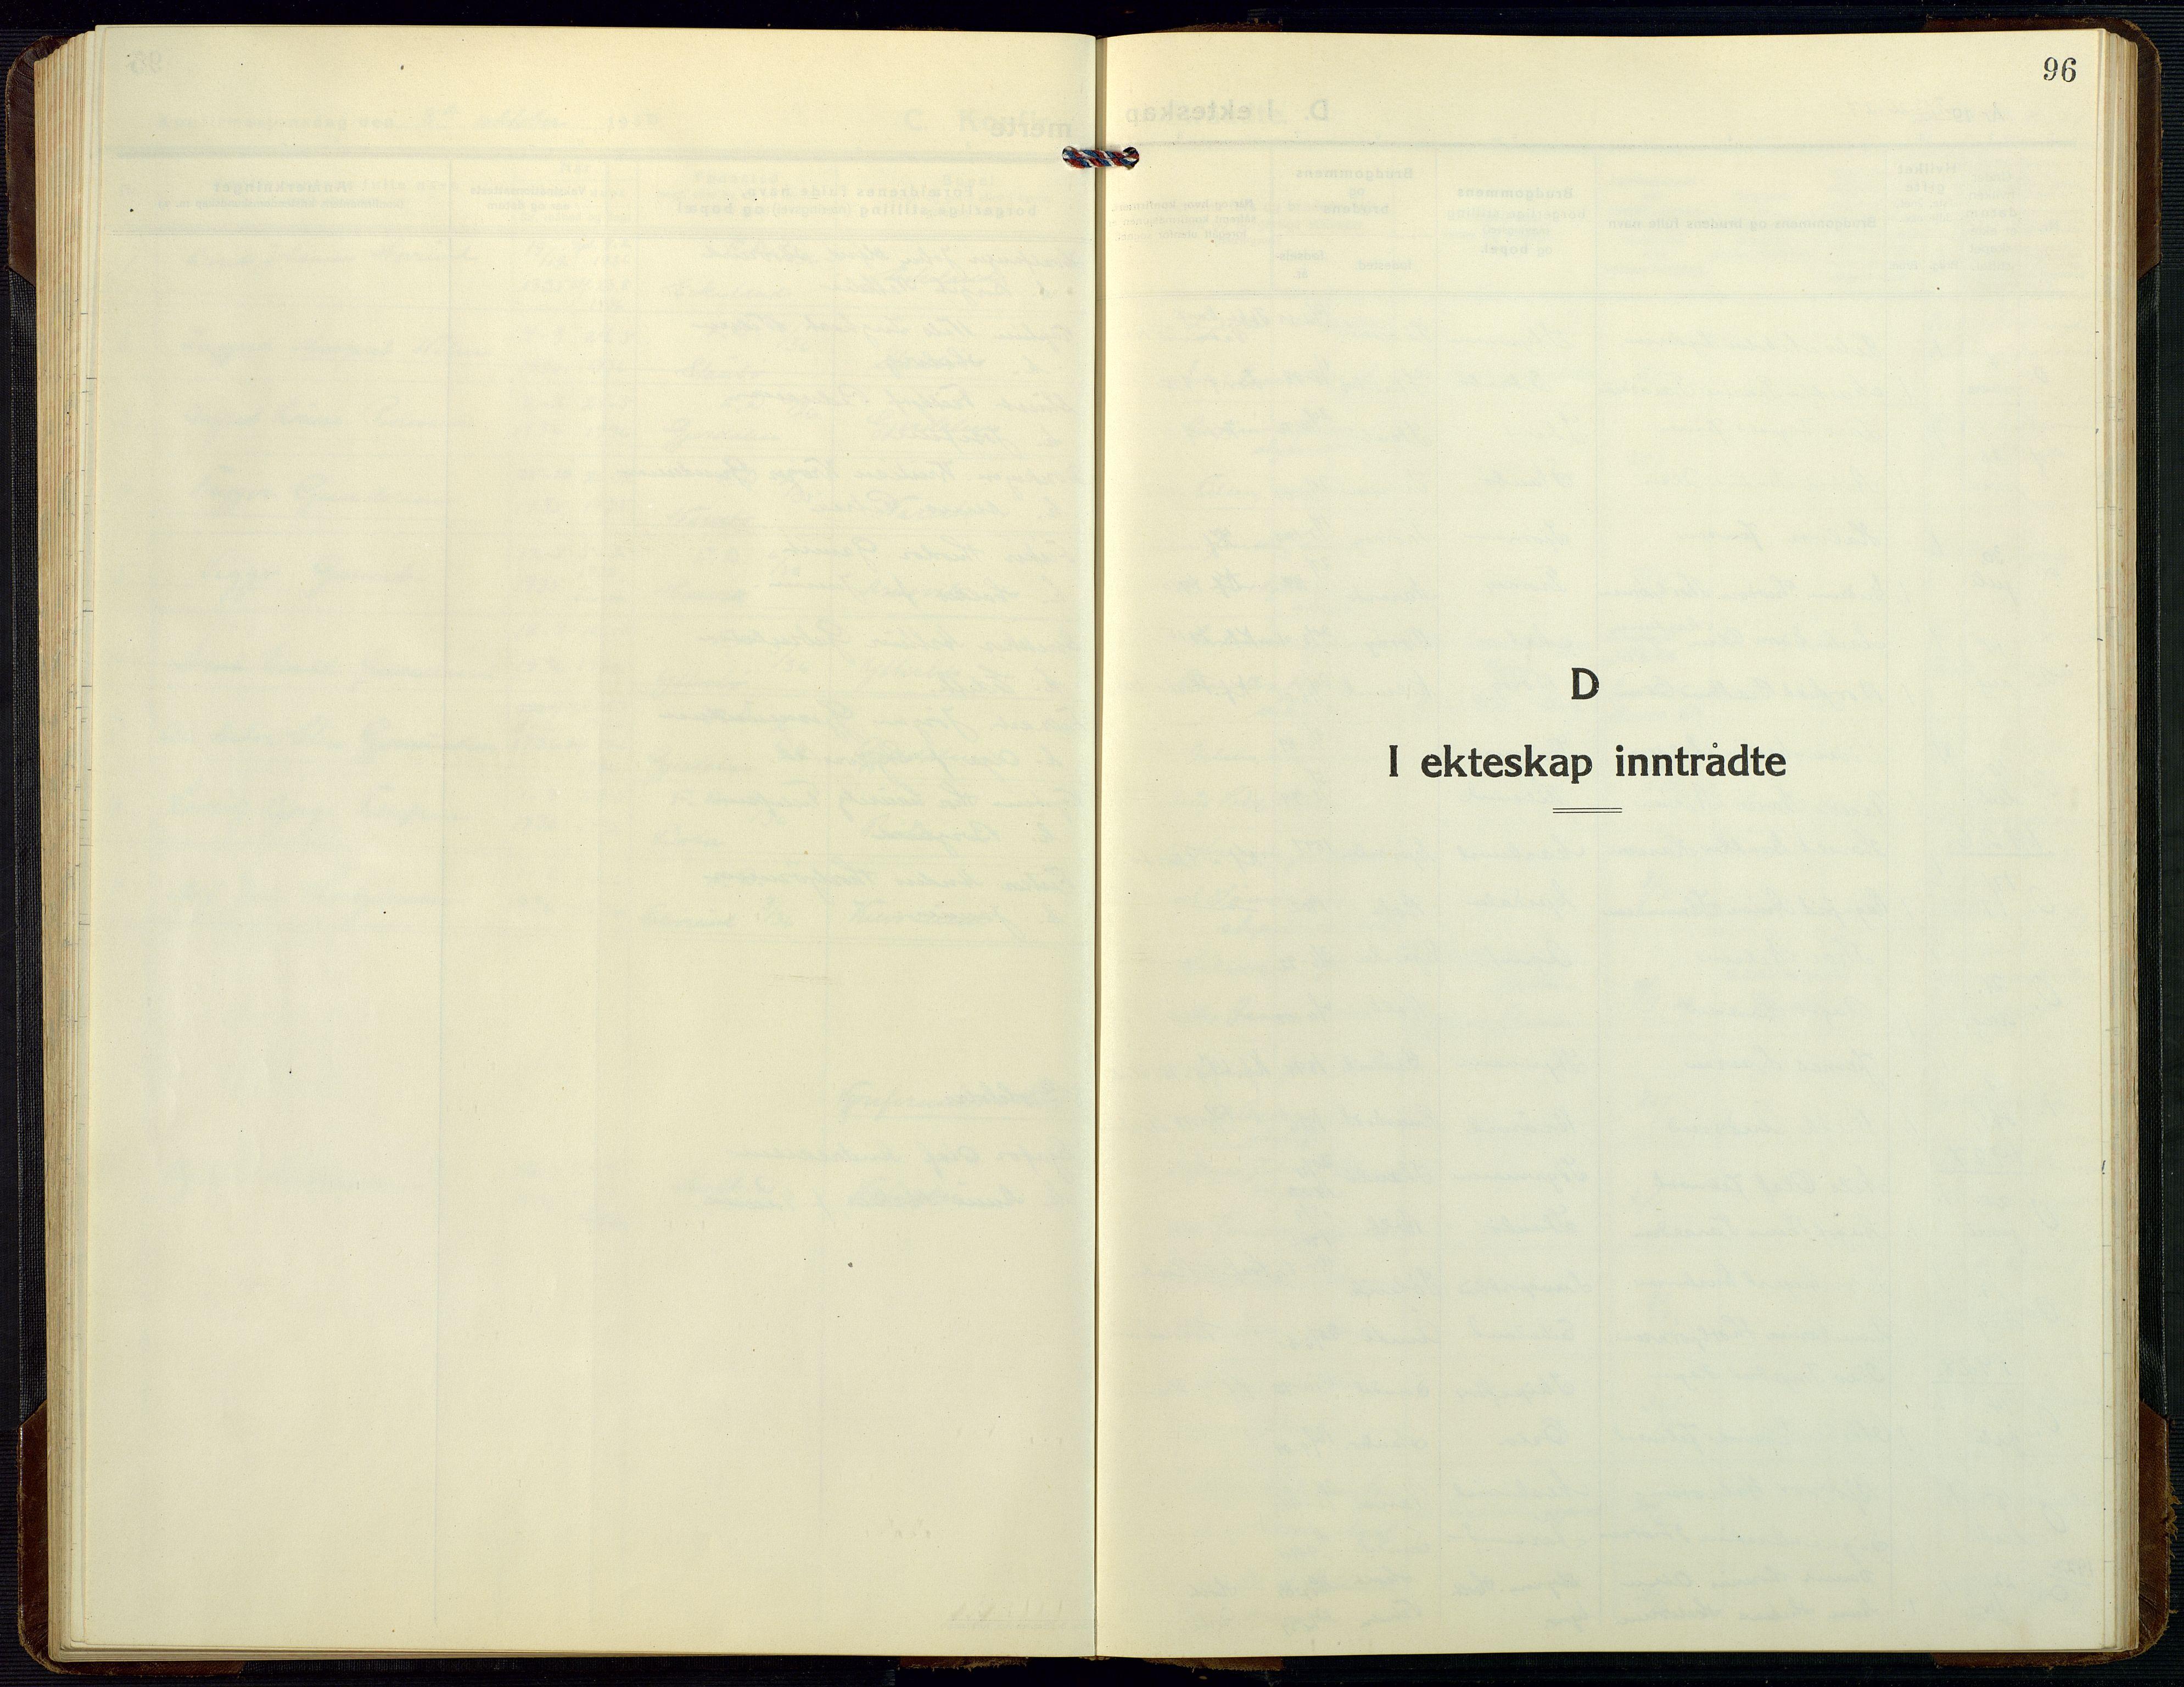 SAK, Dypvåg sokneprestkontor, F/Fb/Fbb/L0006: Klokkerbok nr. B 6, 1925-1954, s. 96